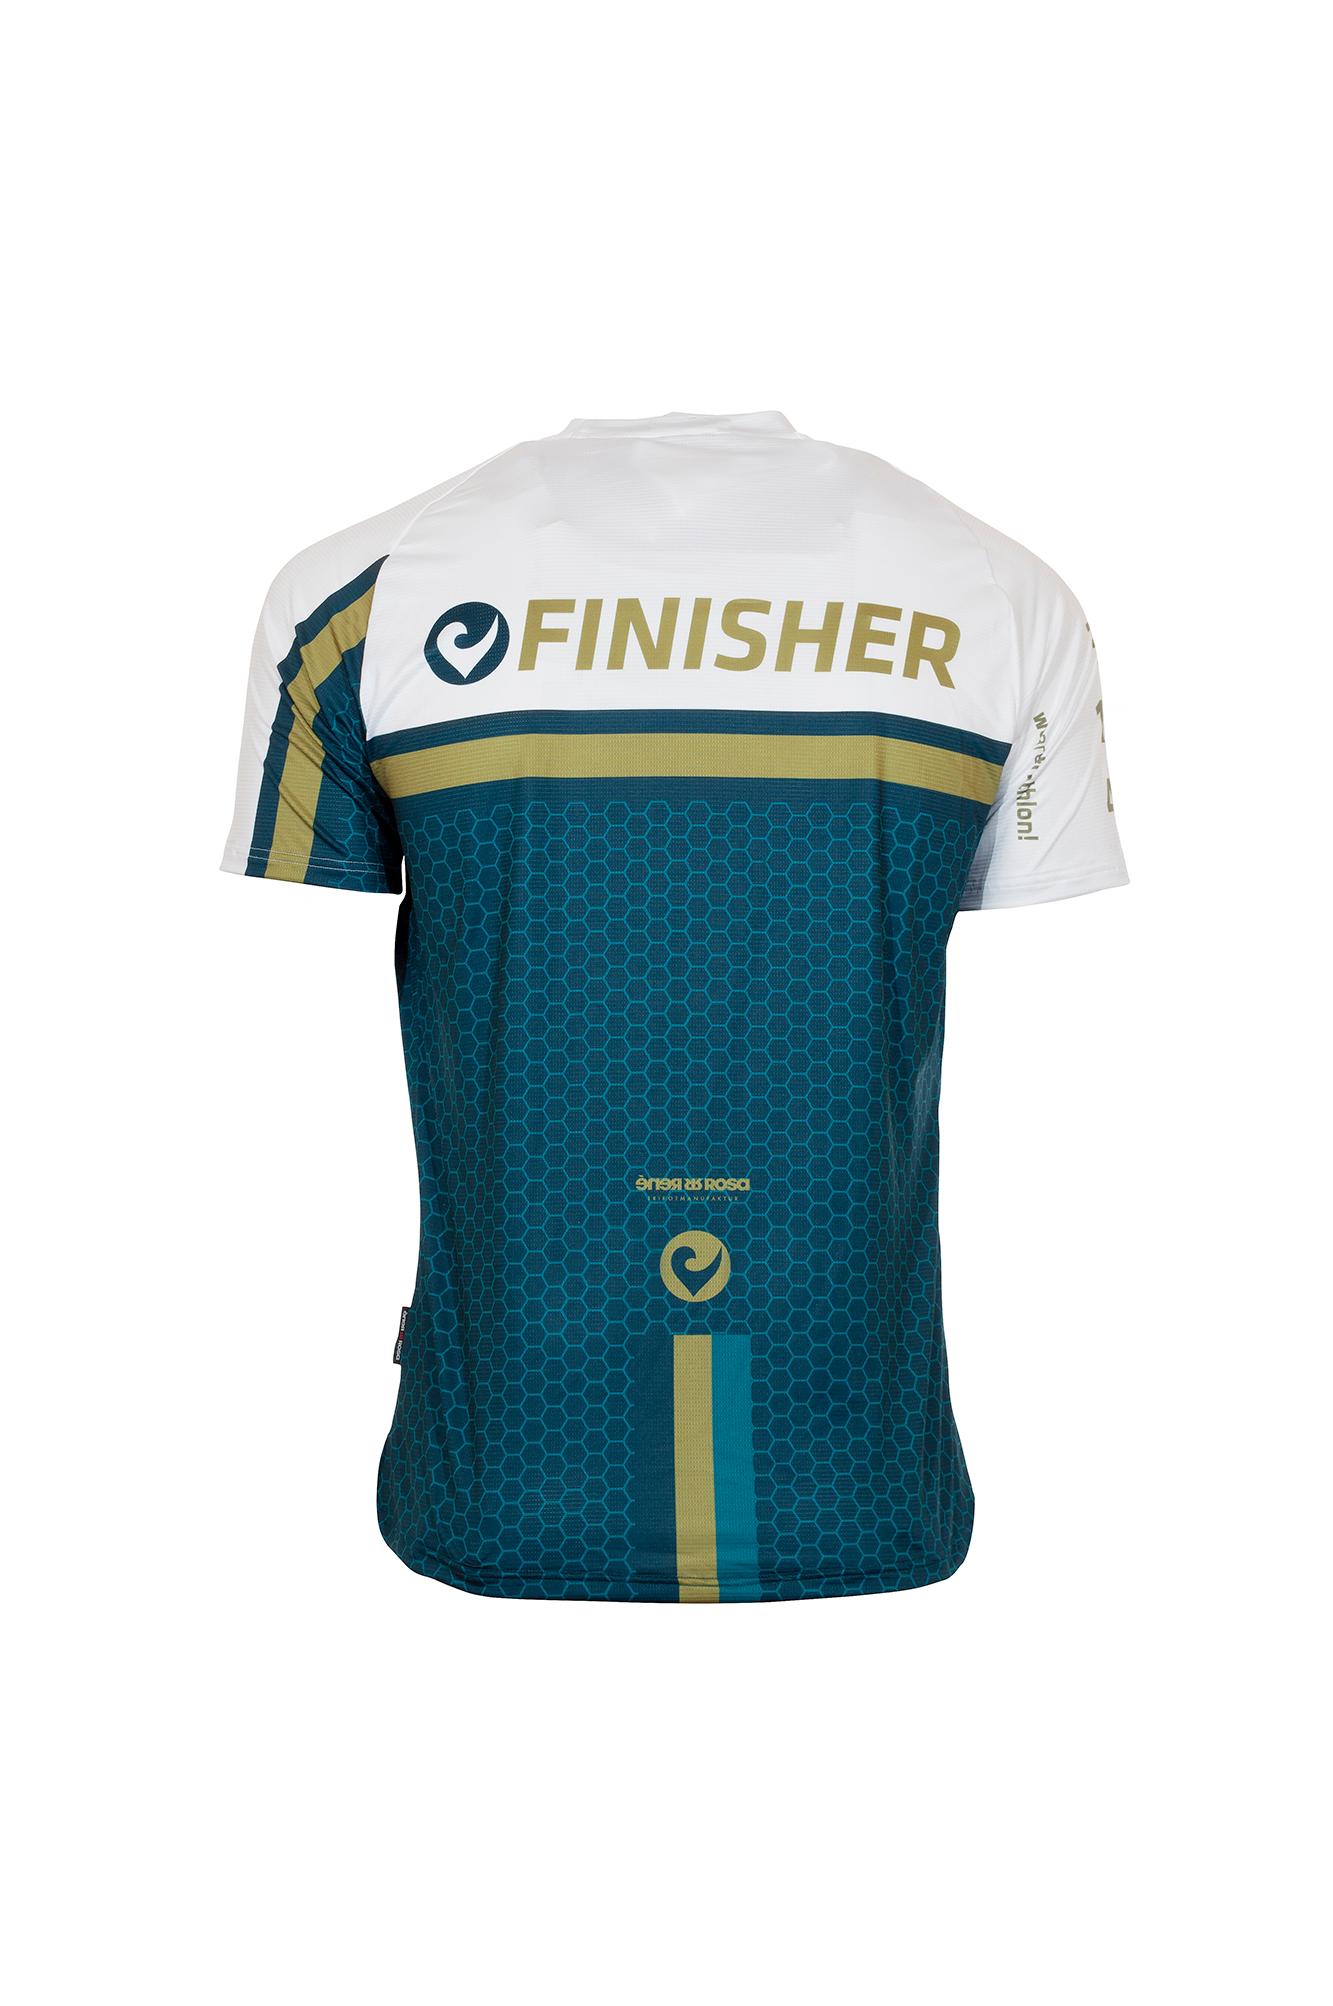 Finisher-Laufshirt kurzarm ALL YEAR-2